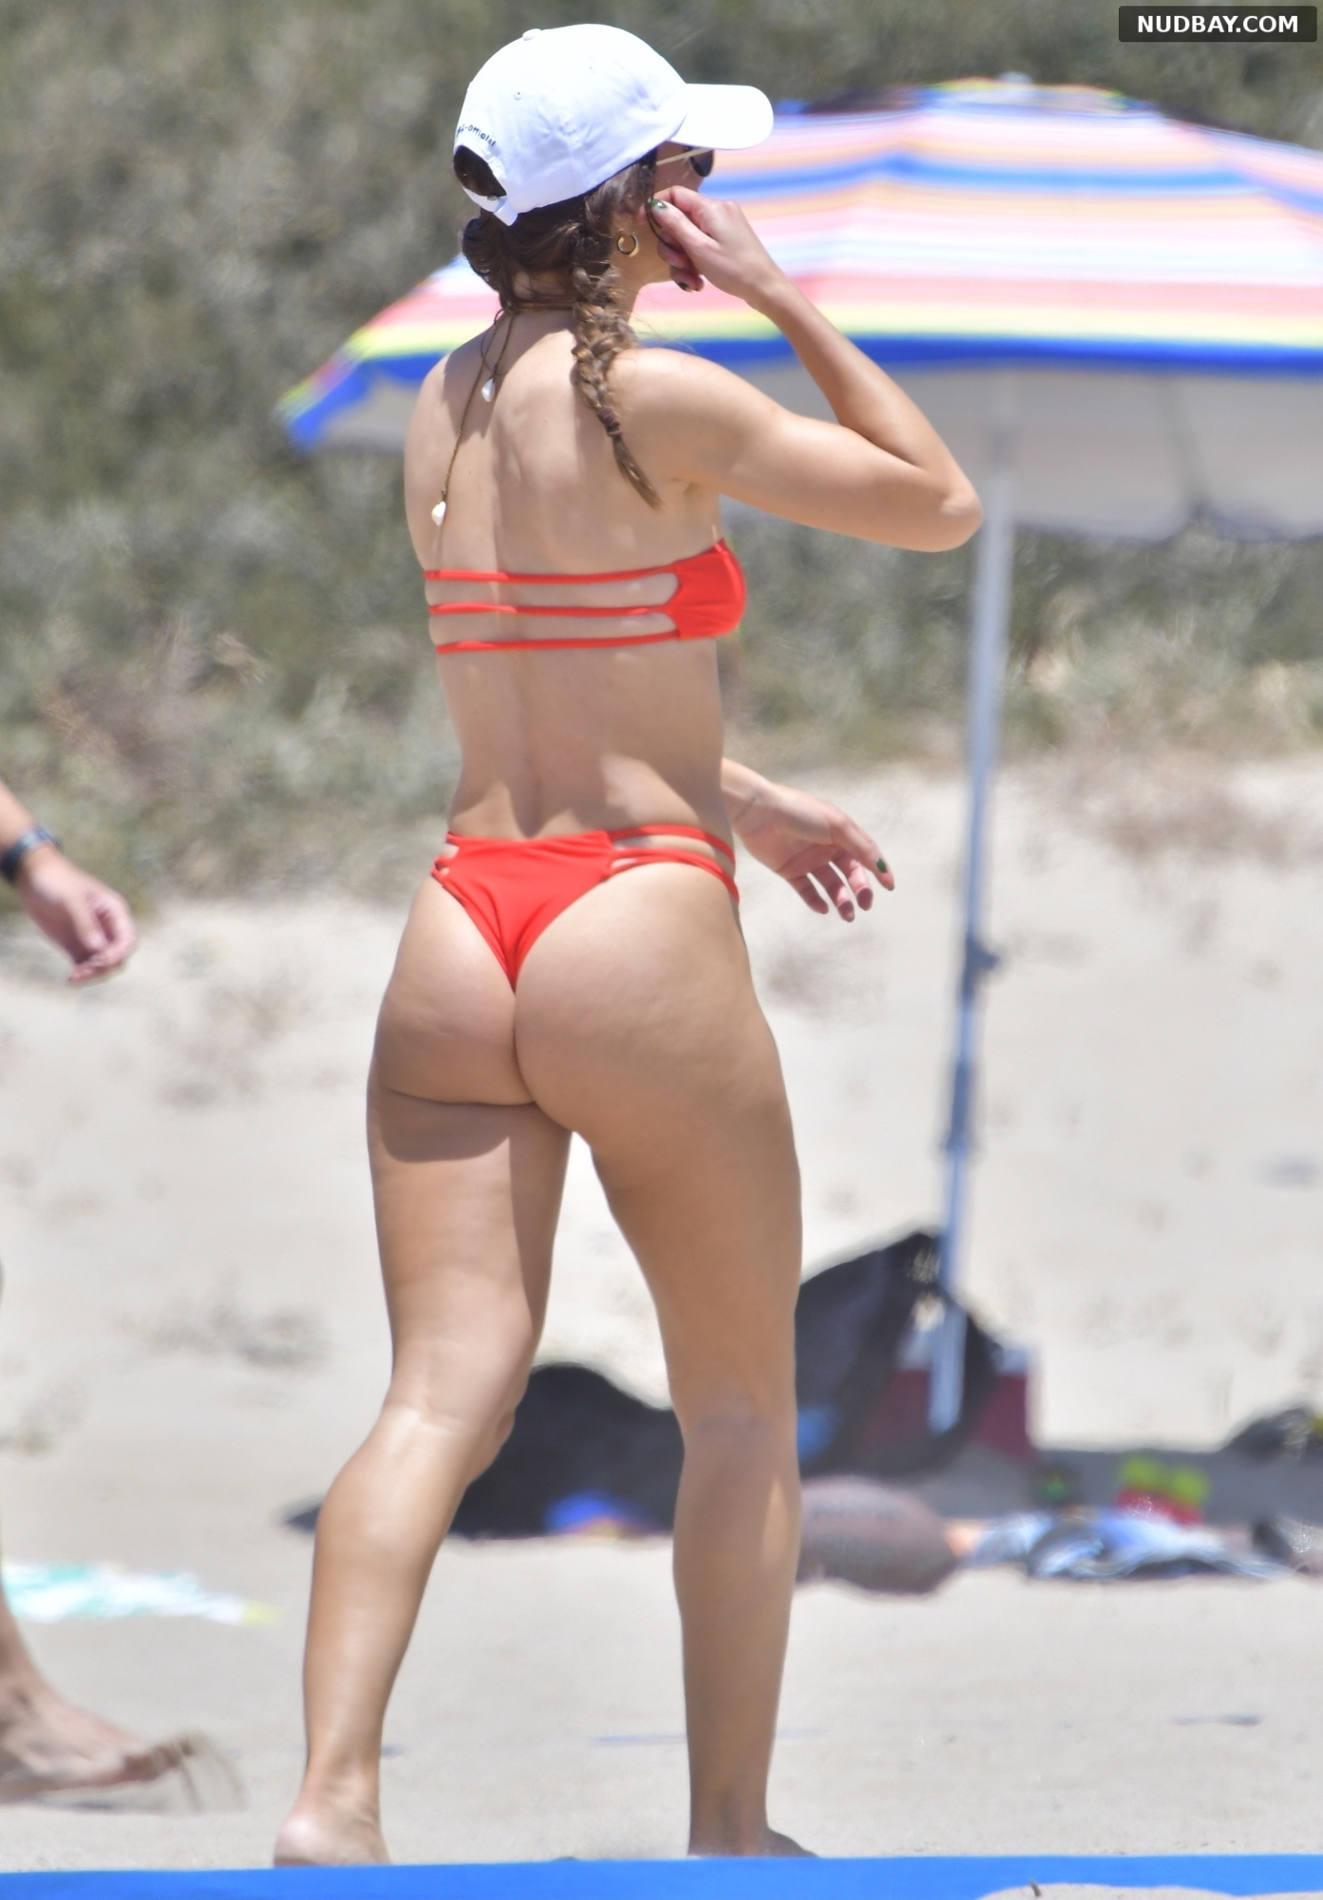 Camila Coelho in a bikini while playing beach volleyball in Santa Monica May 262021